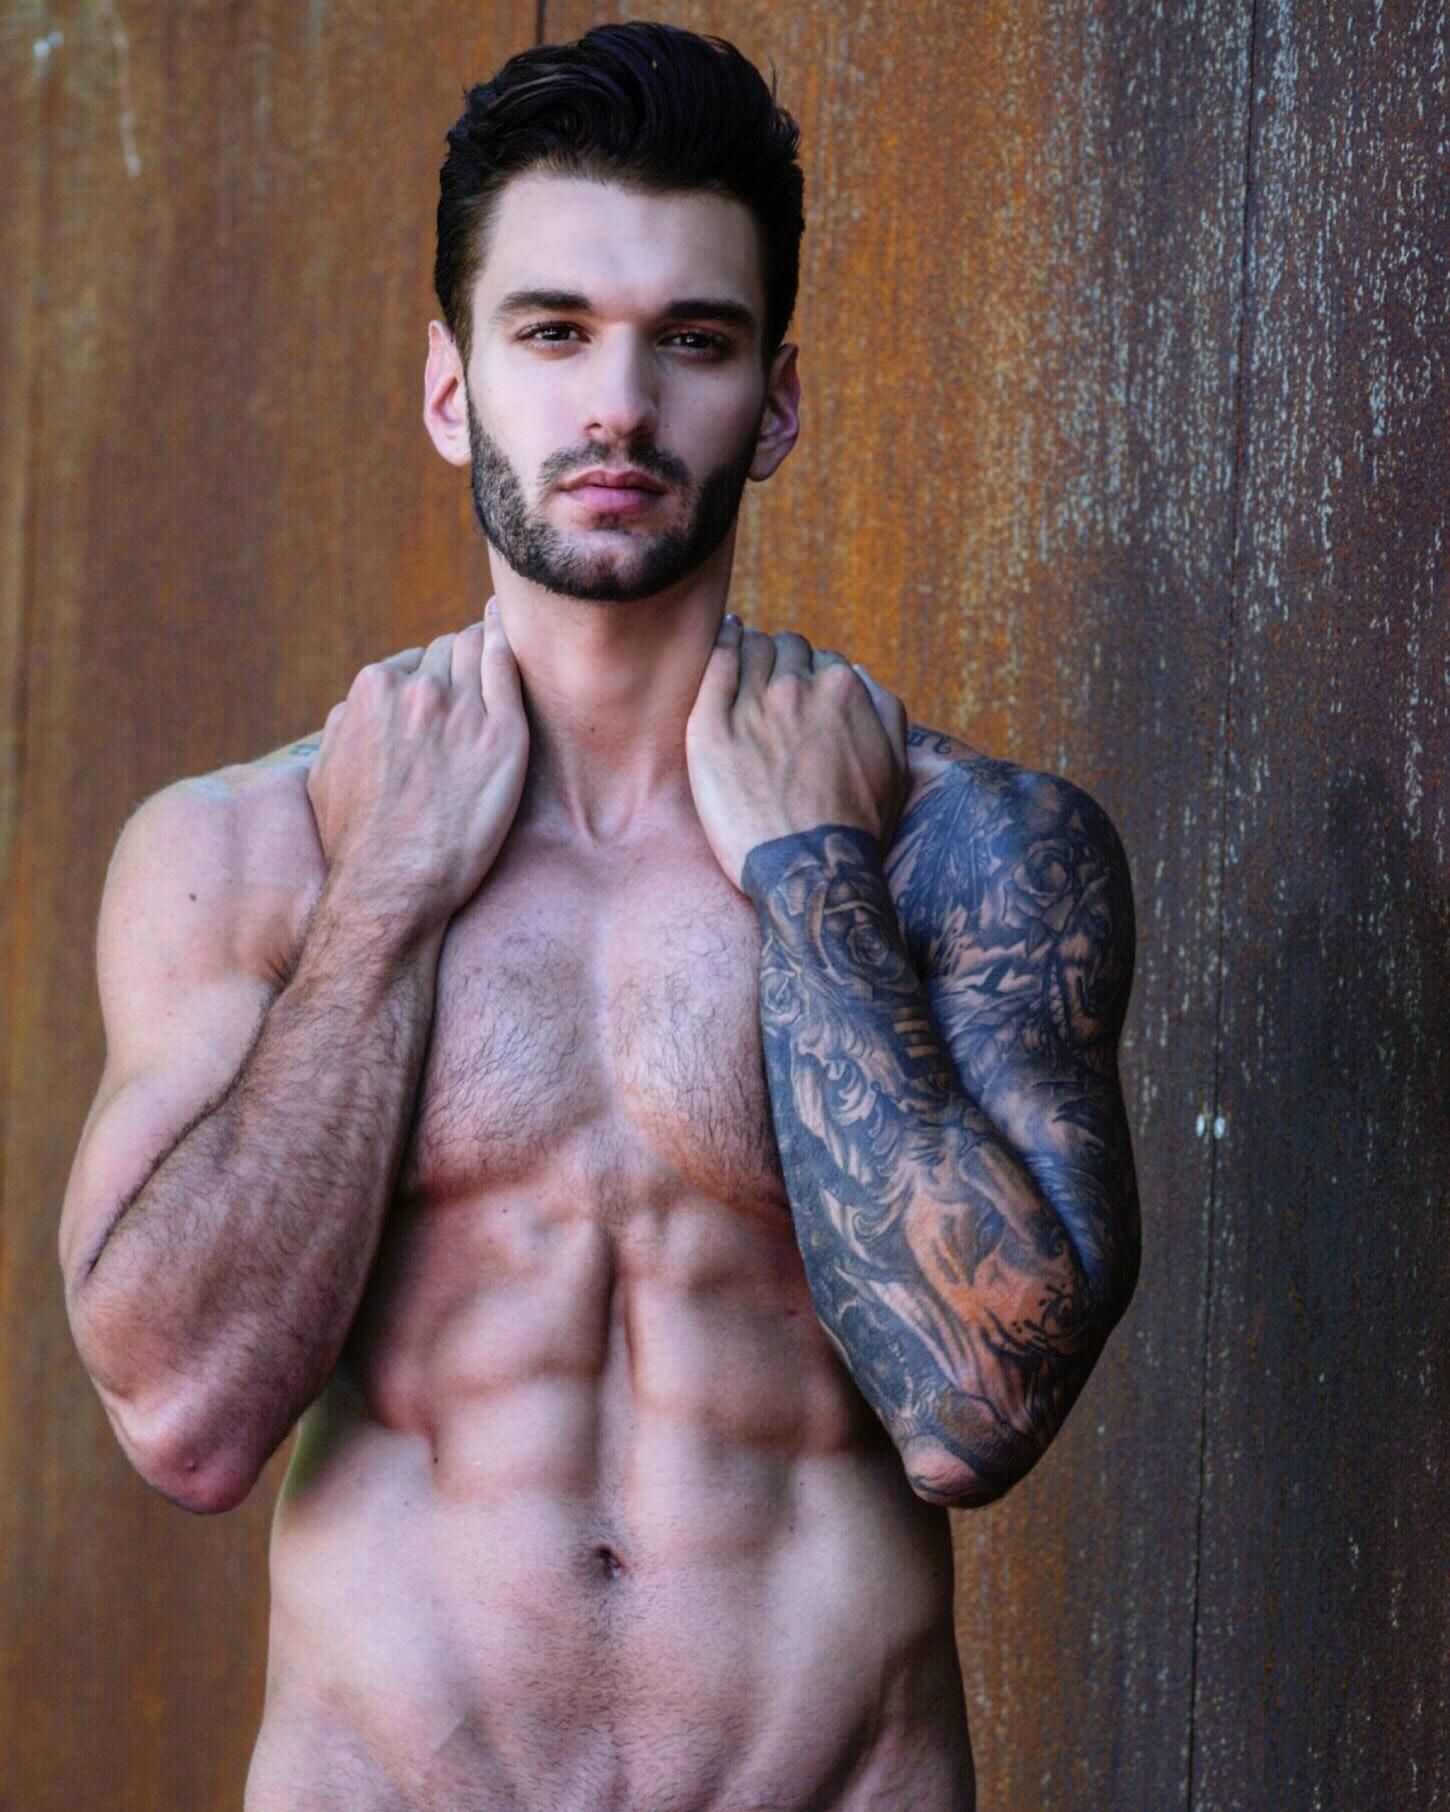 Brian Matarese's Model portfolio